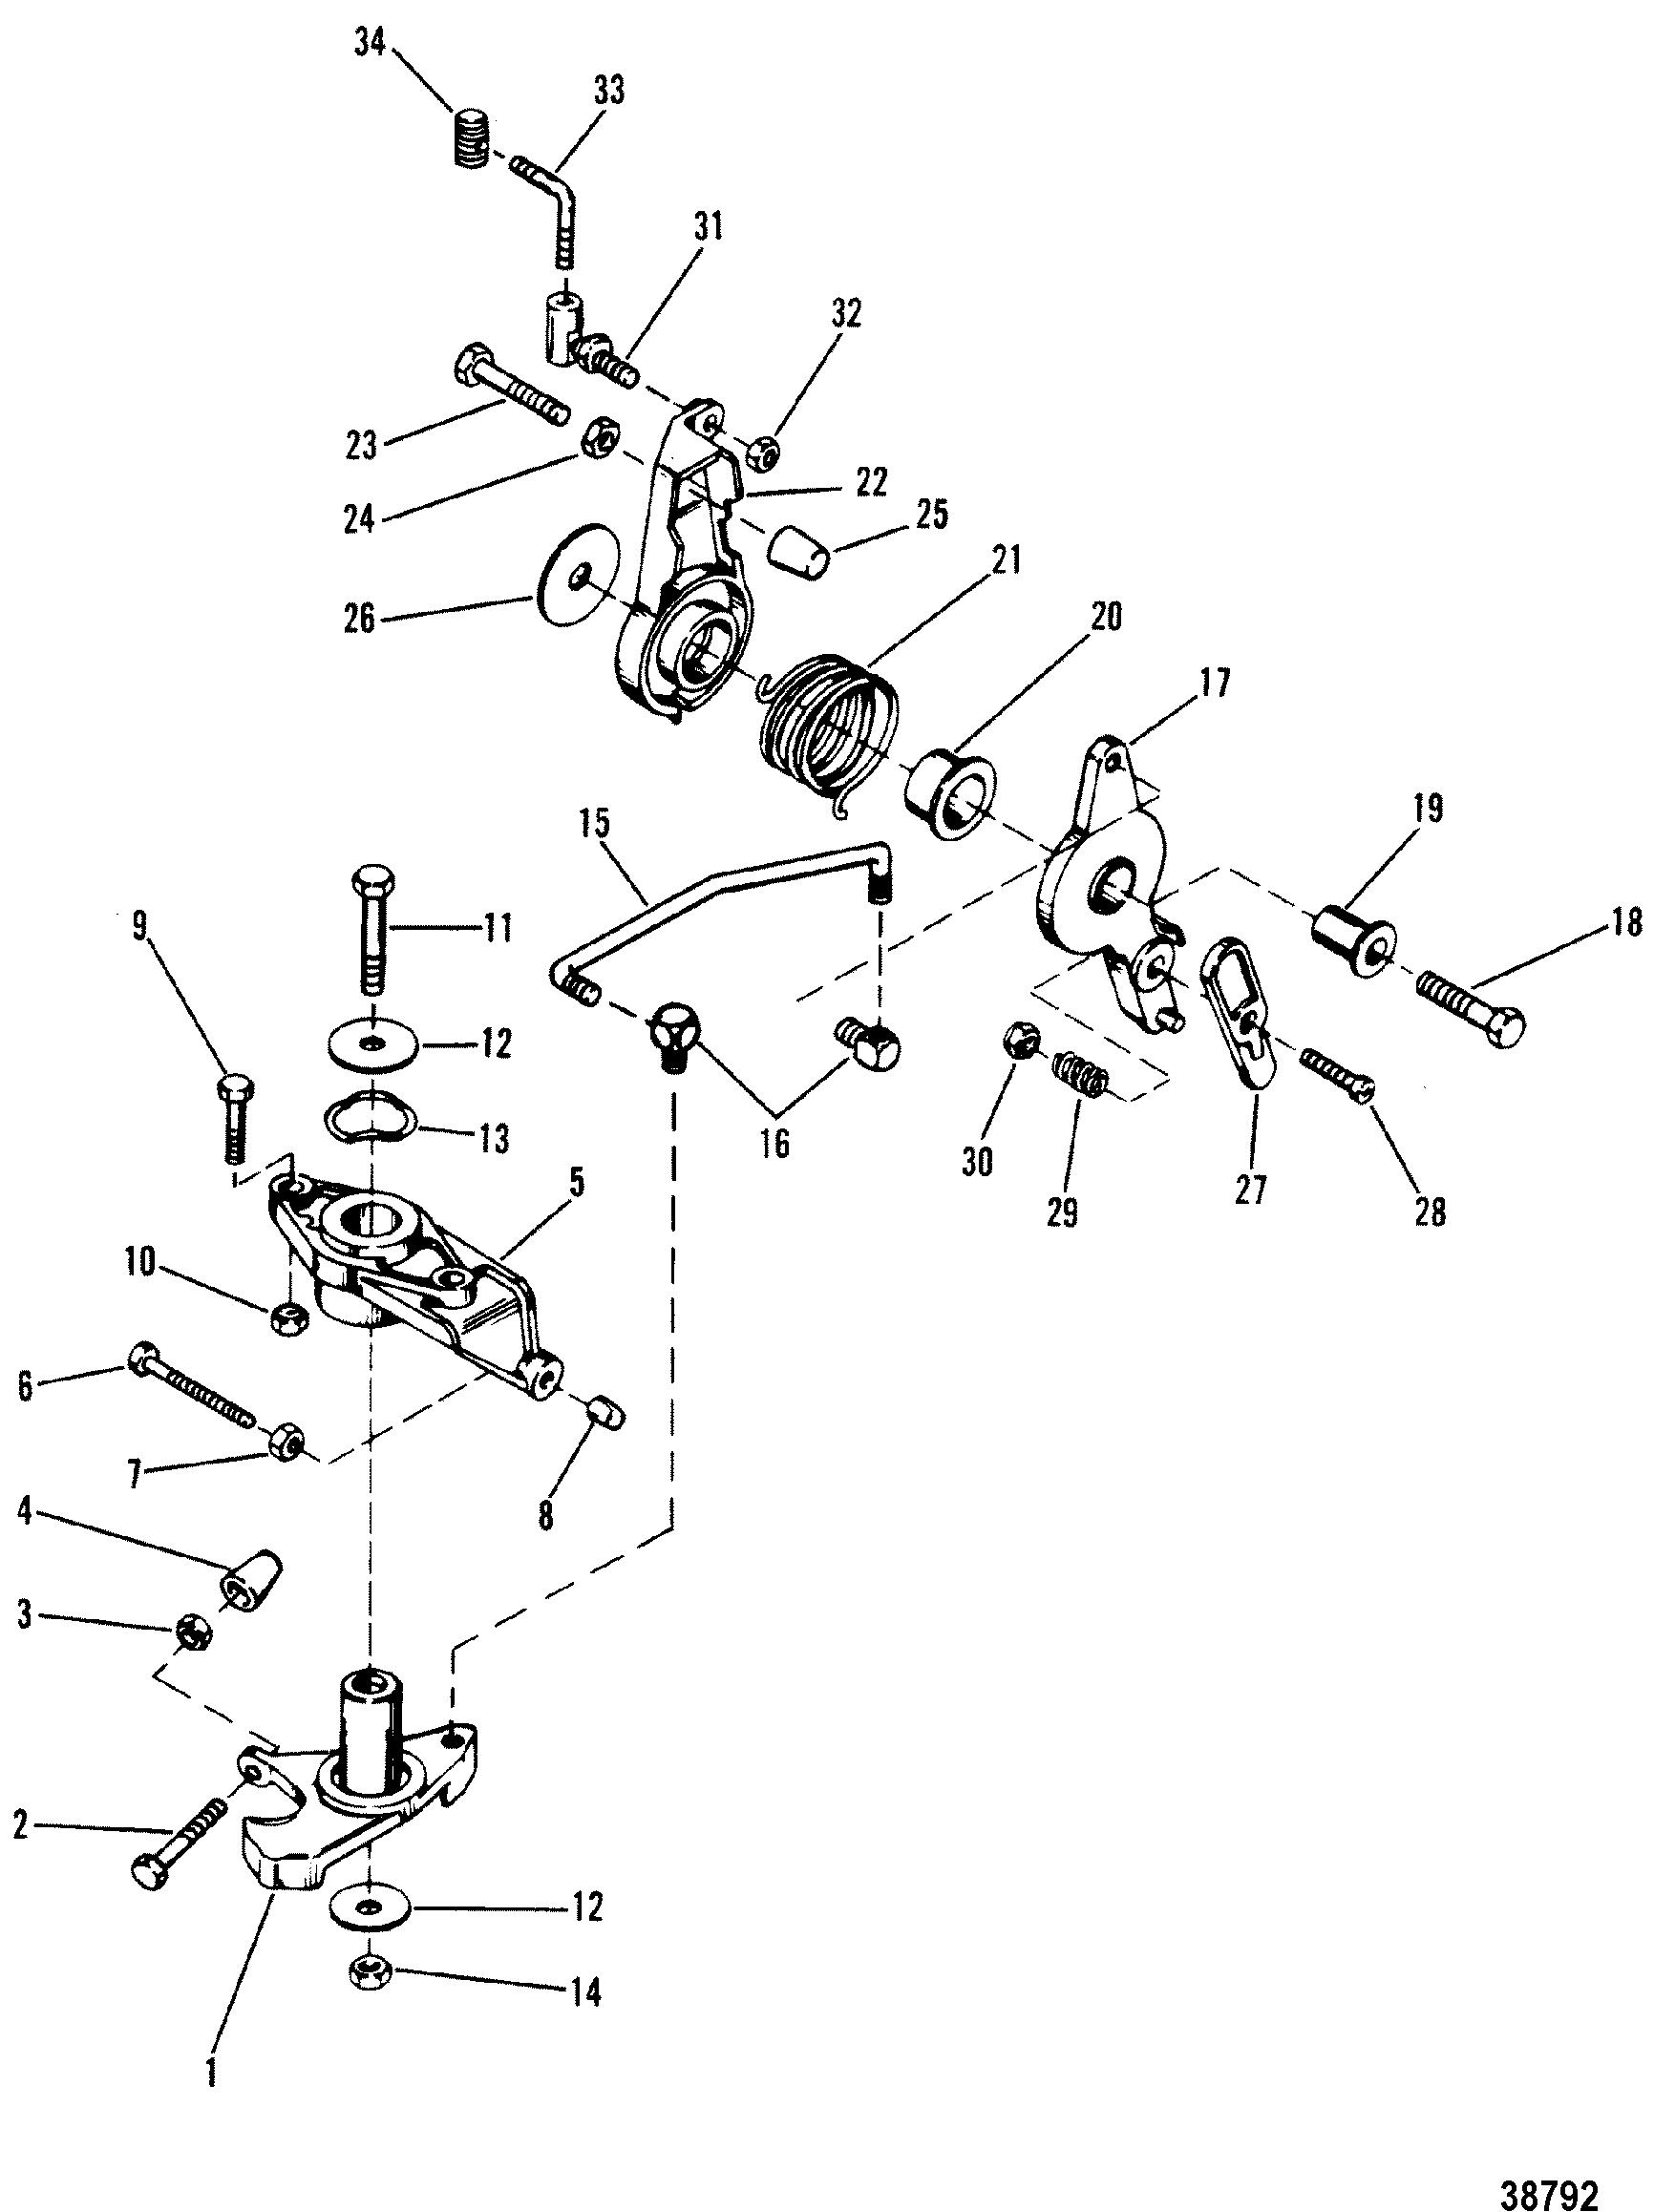 2003 harley davidson sportster wiring diagram html